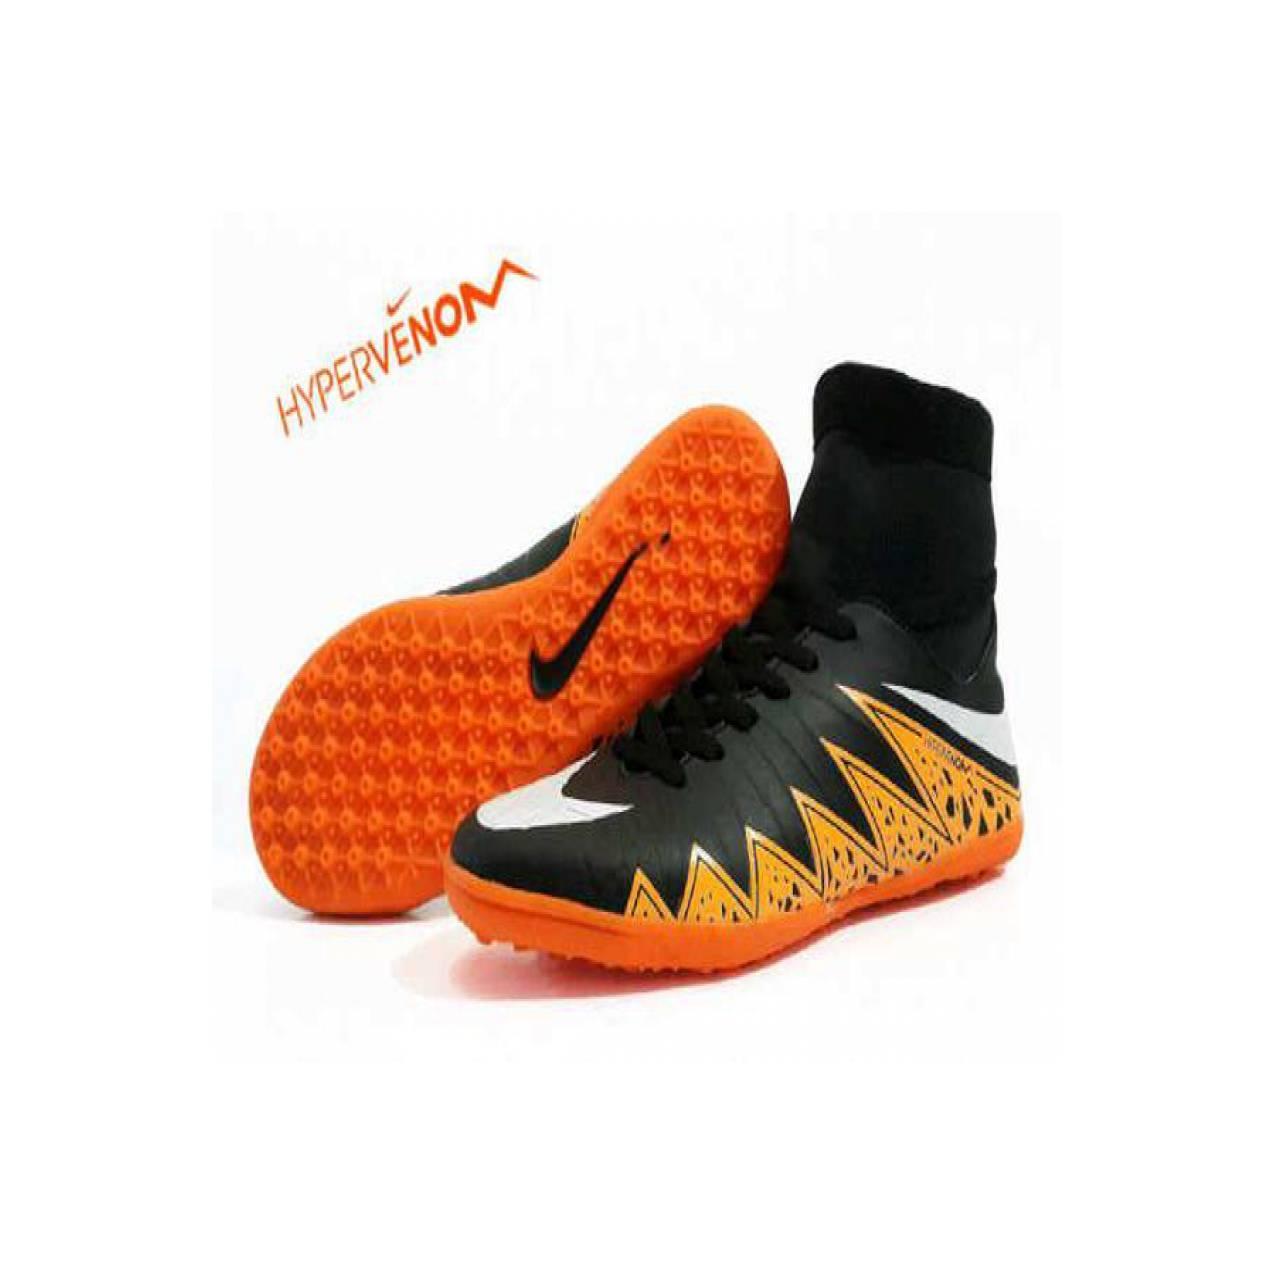 Jual jual sepatu futsal nike hypervnom original premium hitam oren B